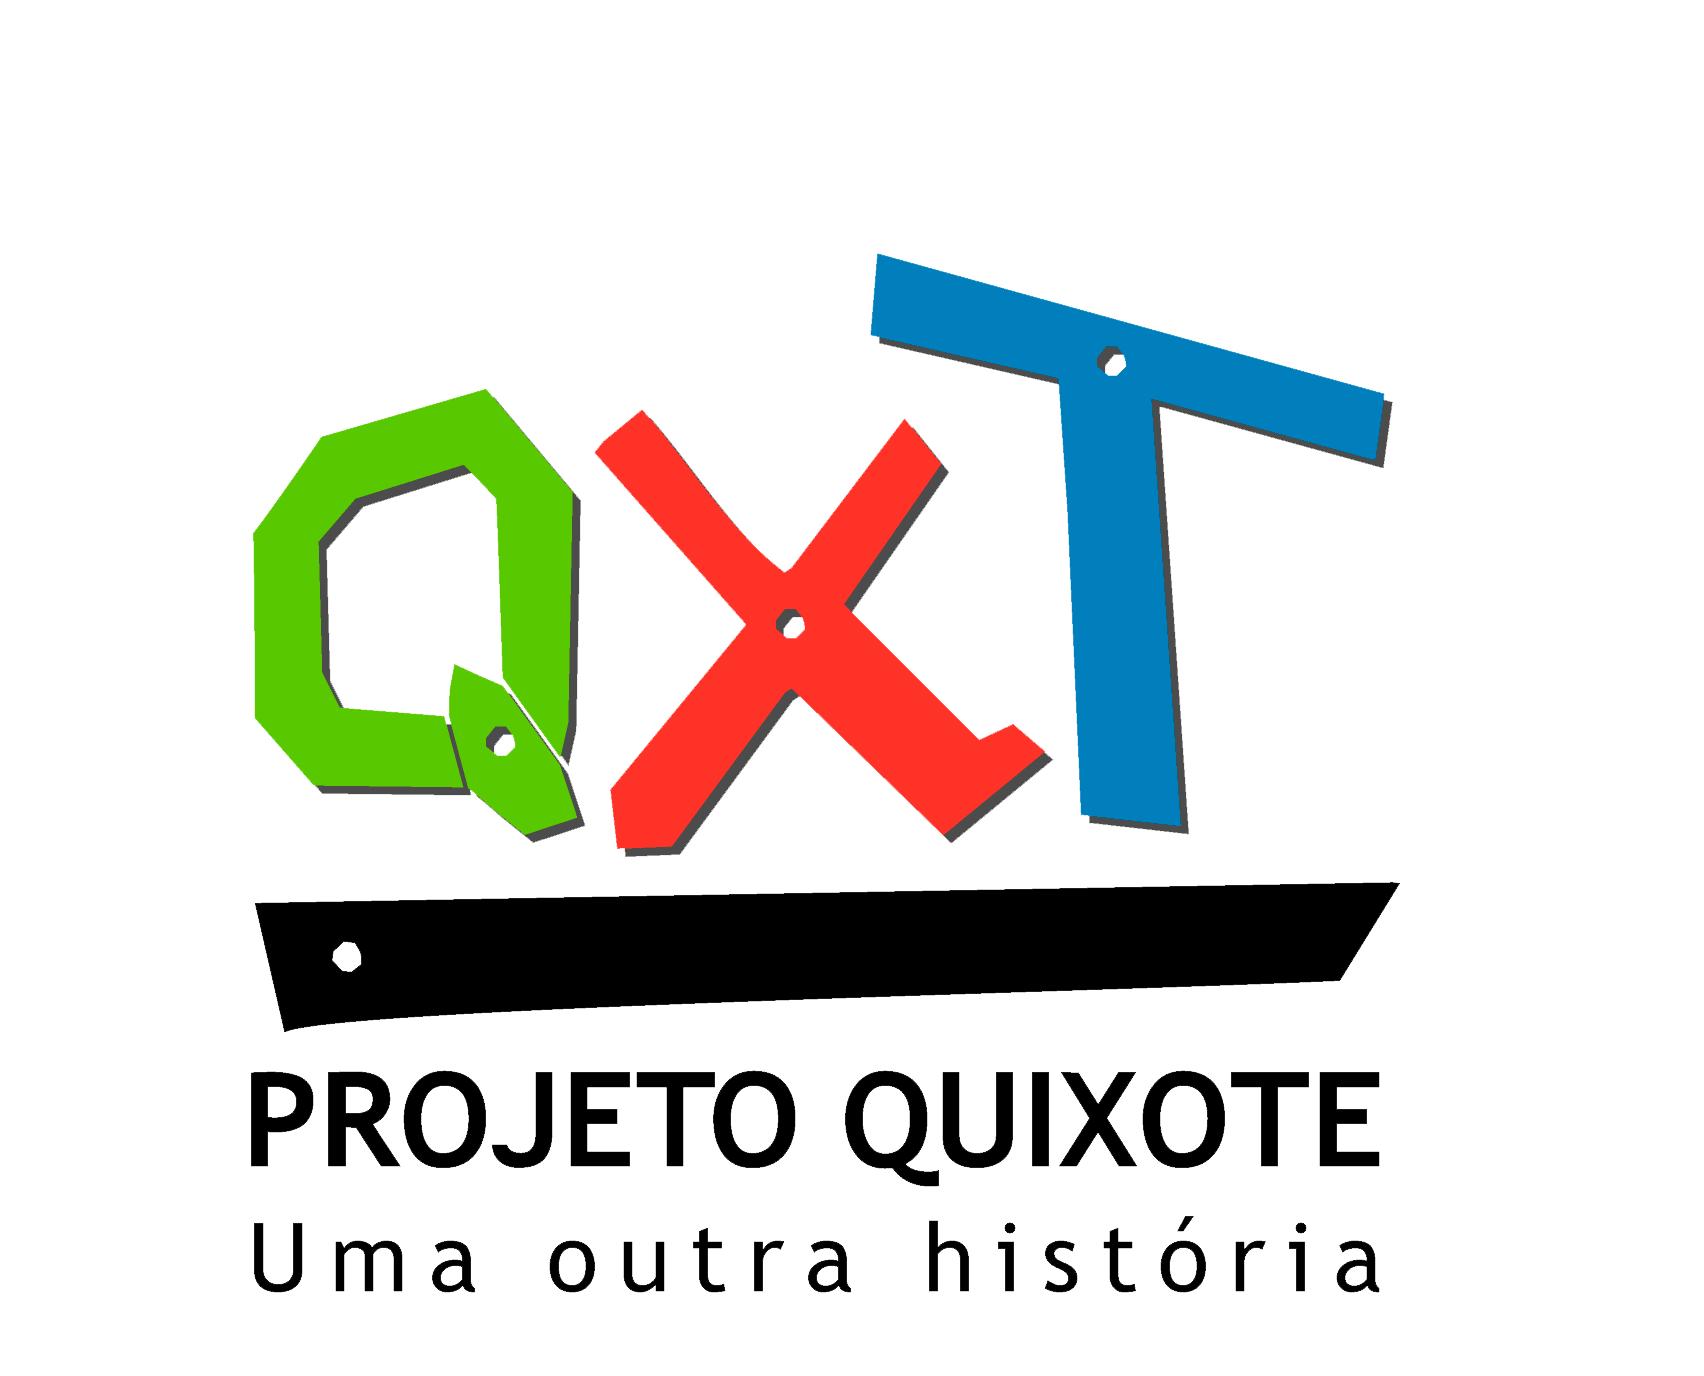 associacao-de-apoio-ao-projeto-quixote